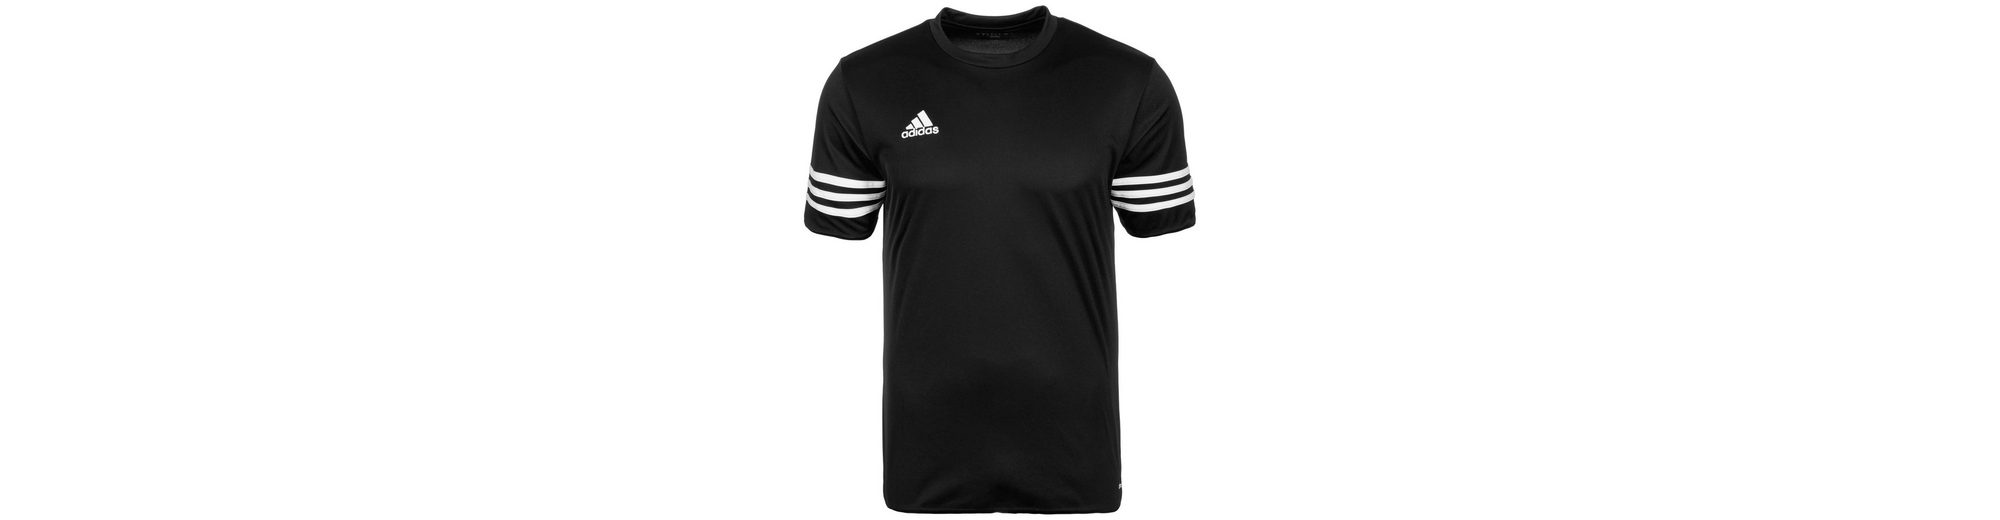 Limited Edition Günstig Online Auftrag adidas Performance Fußballtrikot Entrada 14 CGb5JuB